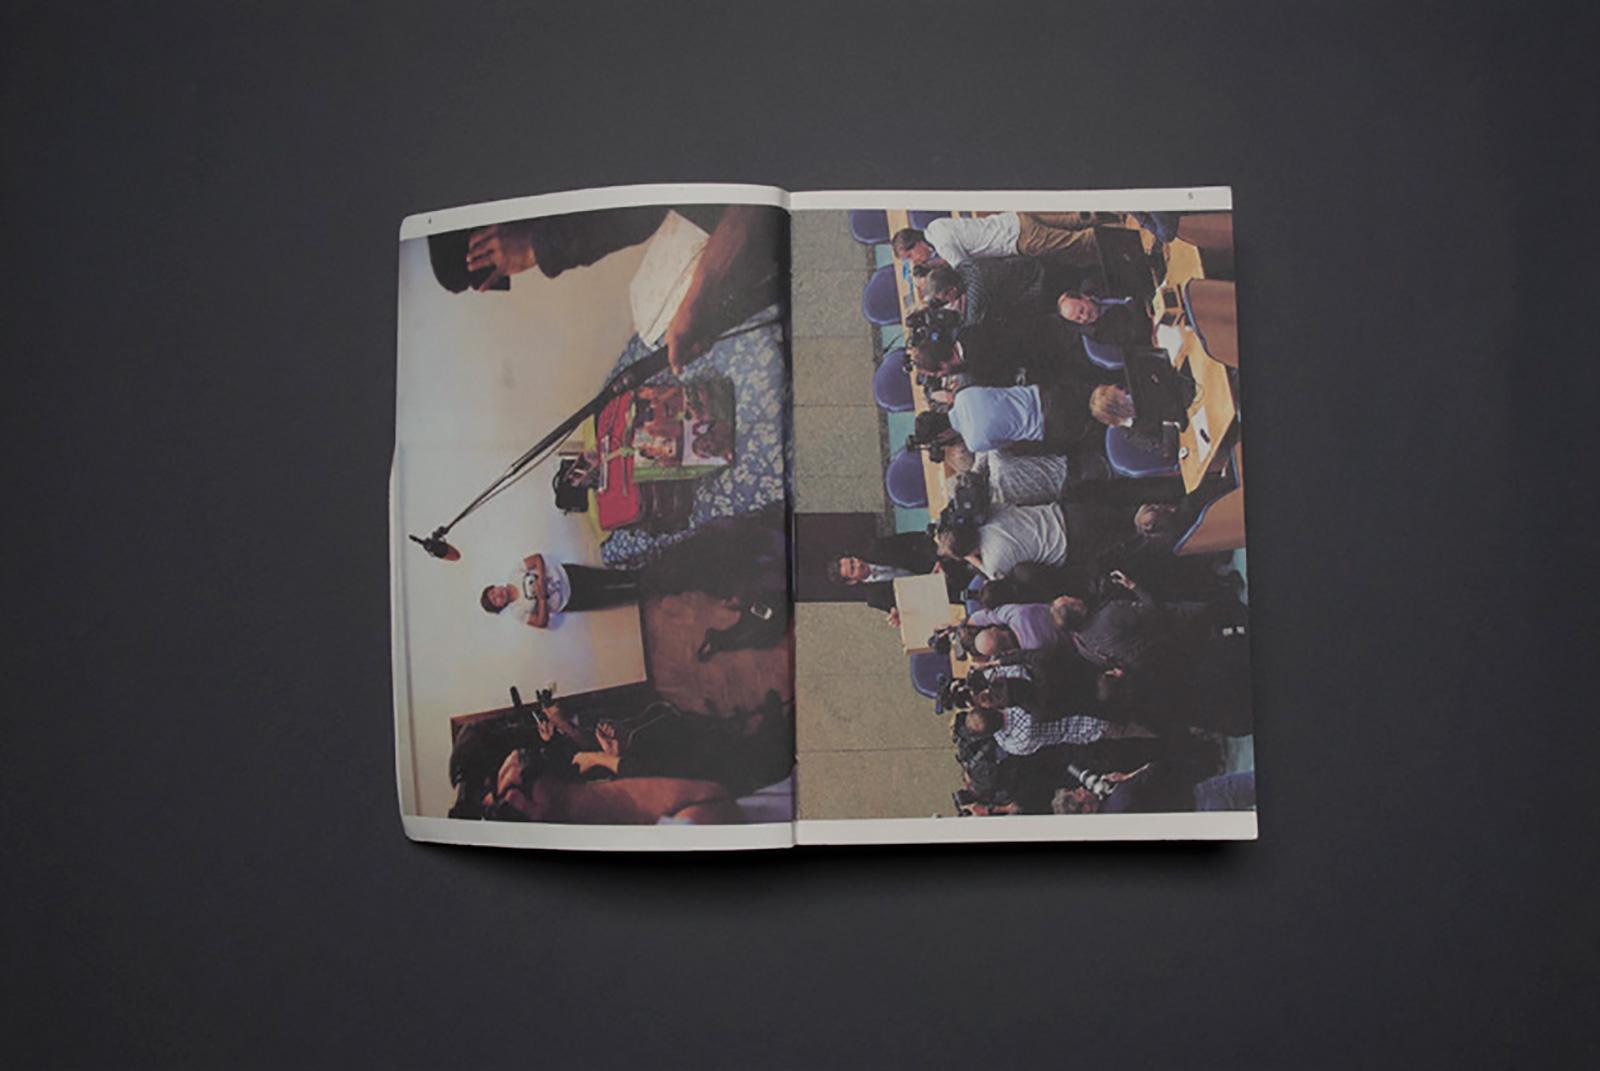 whats-inside-the-koffer-book-wilco-monen-02.jpg